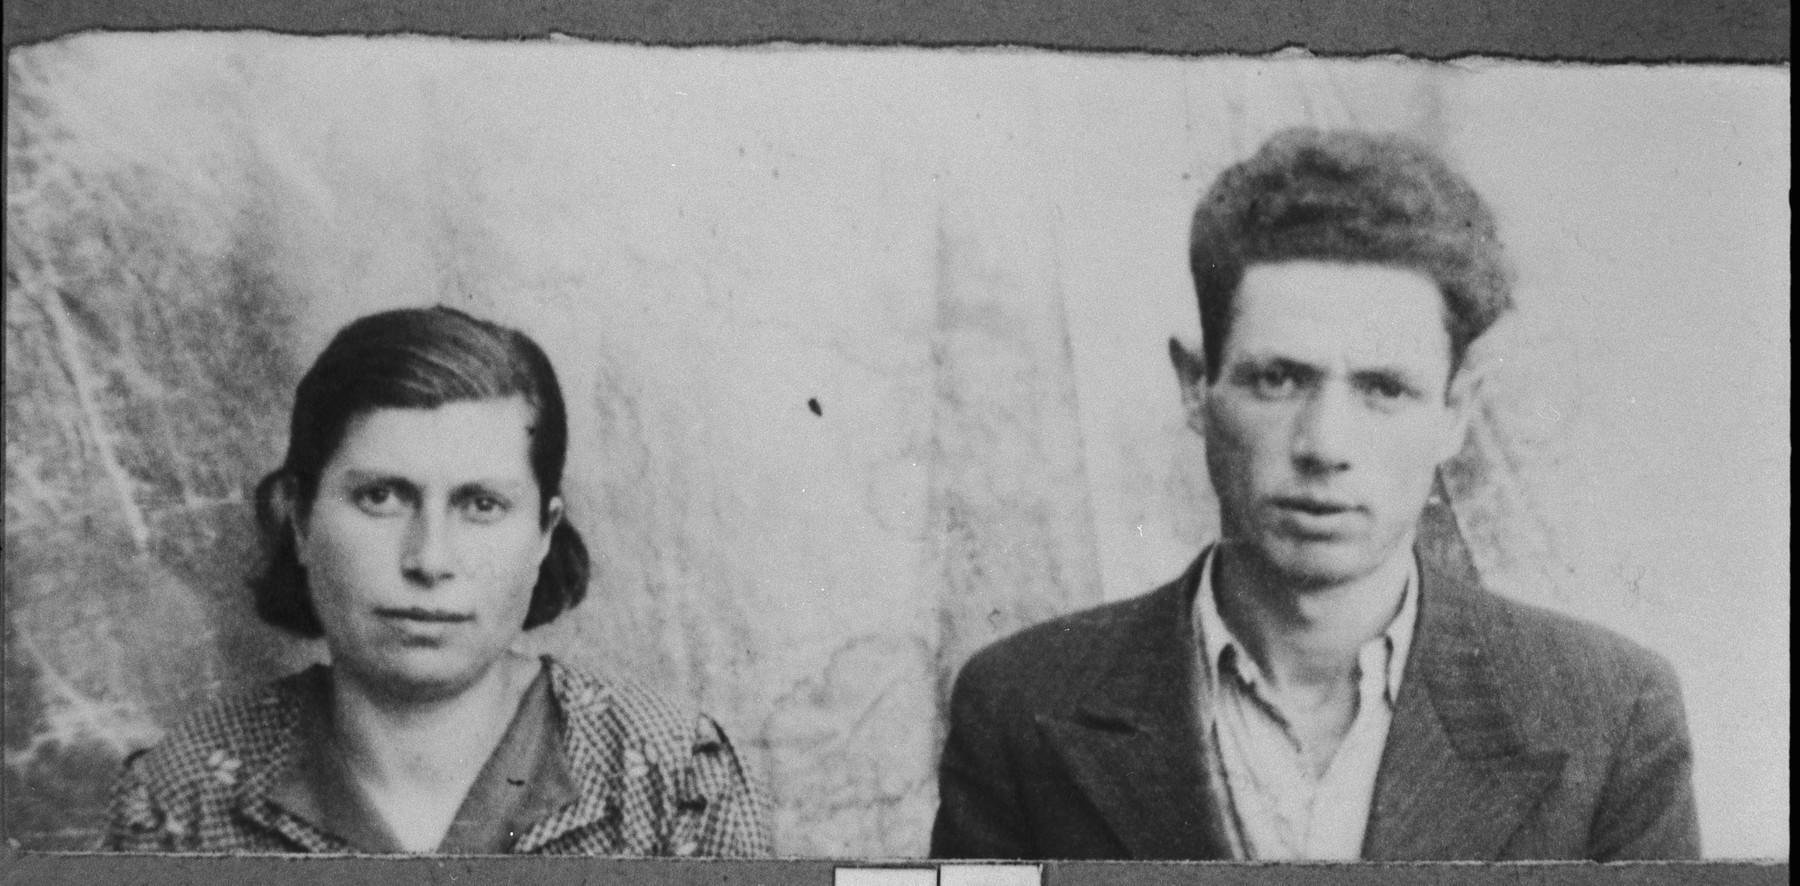 Portrait of Avram Albocher, son of Haim Albocher, and his wife, Arnesta.  He was a greengrocer.  They lived at Kossantschitscheva 20 in Bitola.